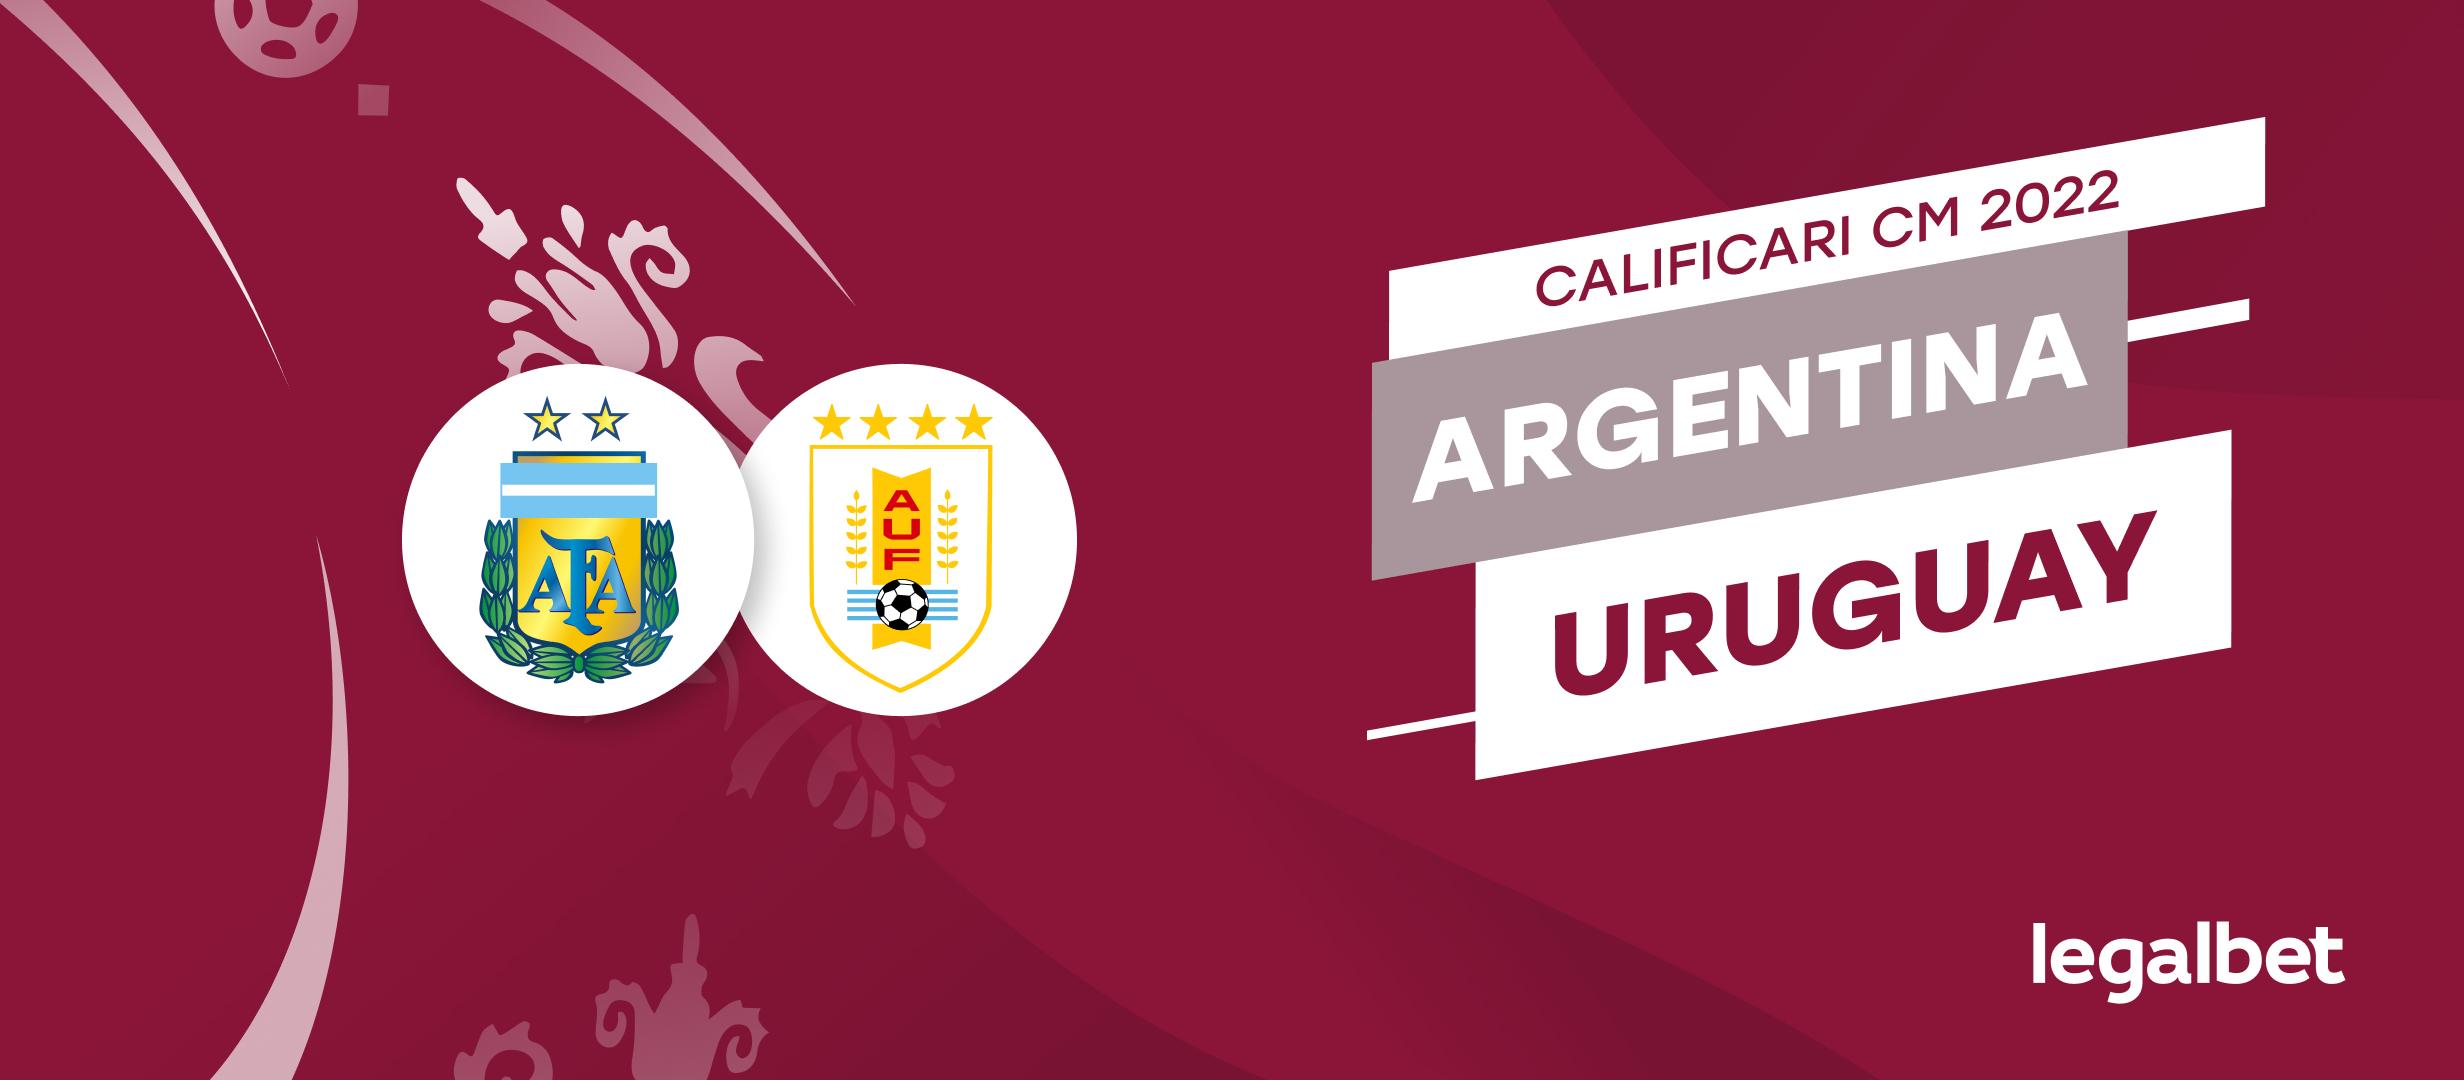 Argentina vs Uruguay – cote la pariuri, ponturi si informatii